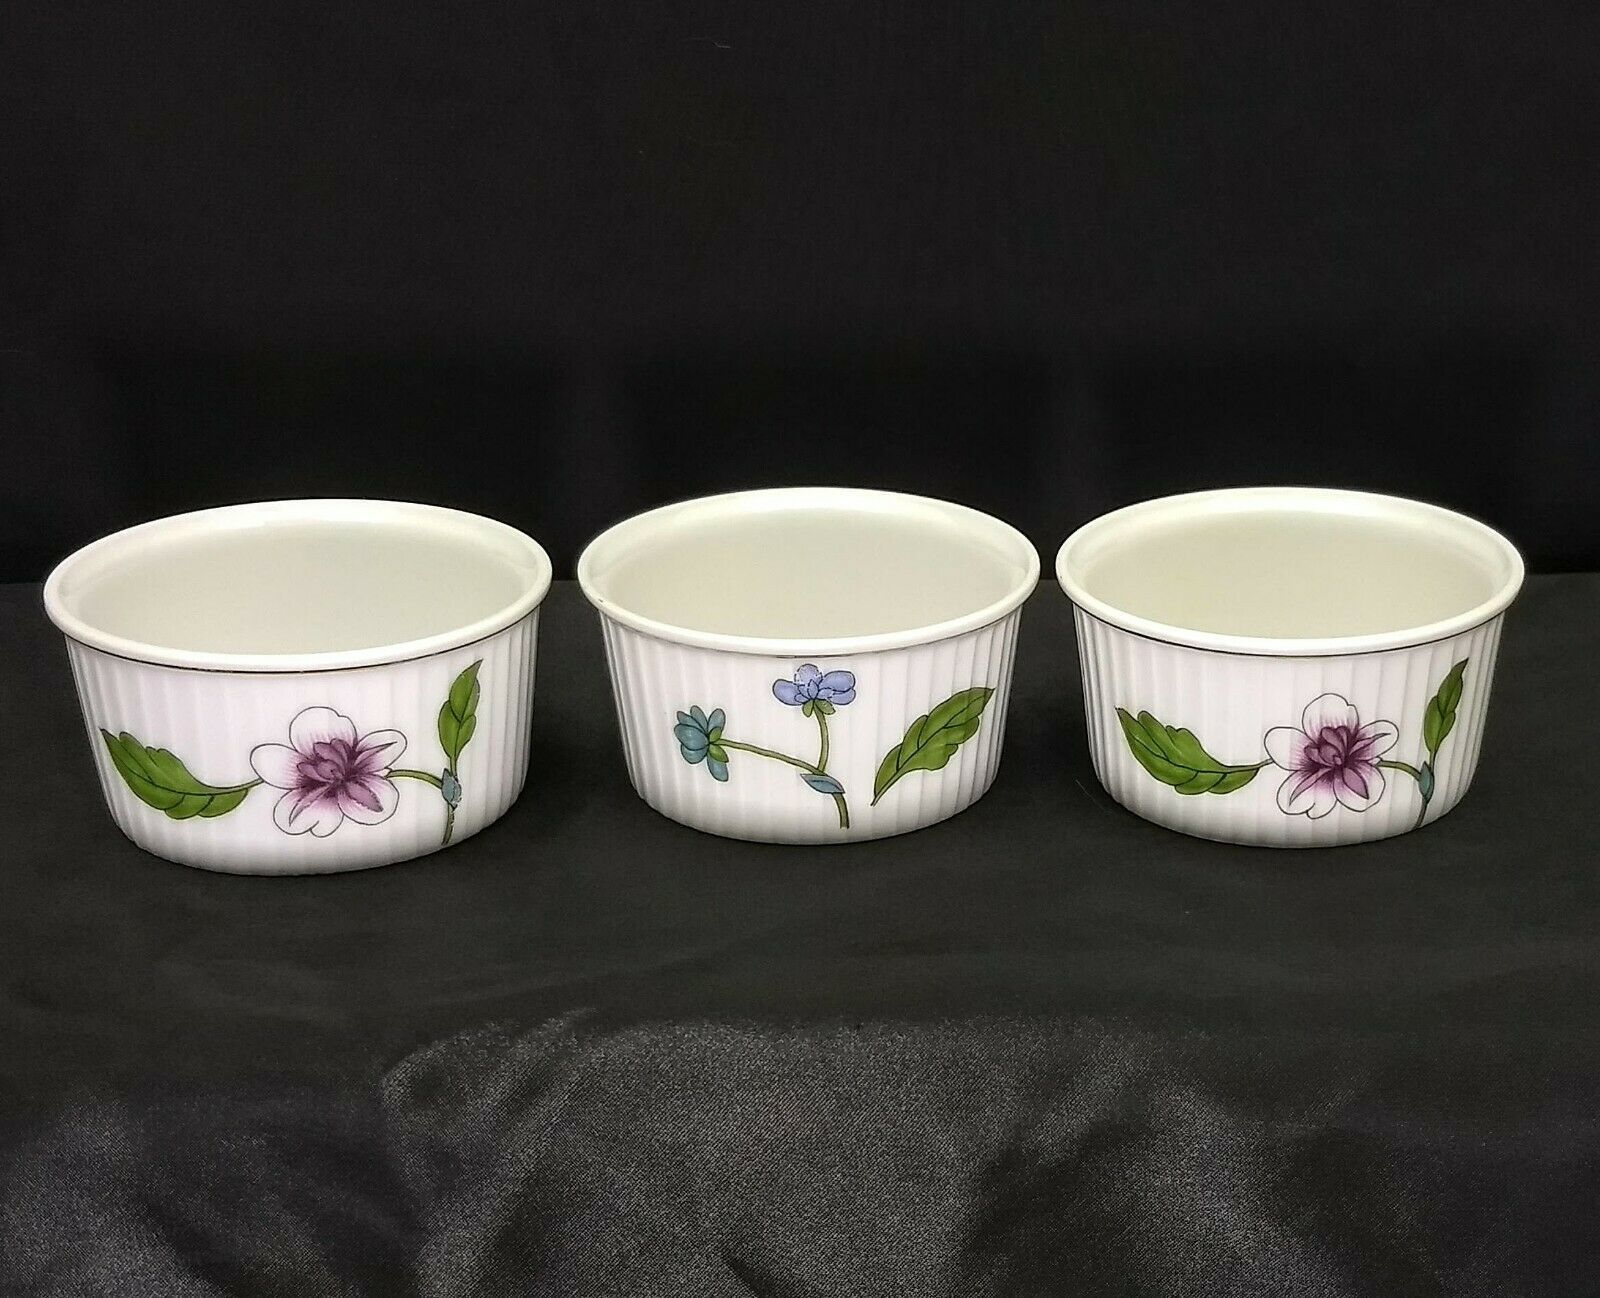 Set of 3 Royal Worcester Astley Floral Pattern Ramekins